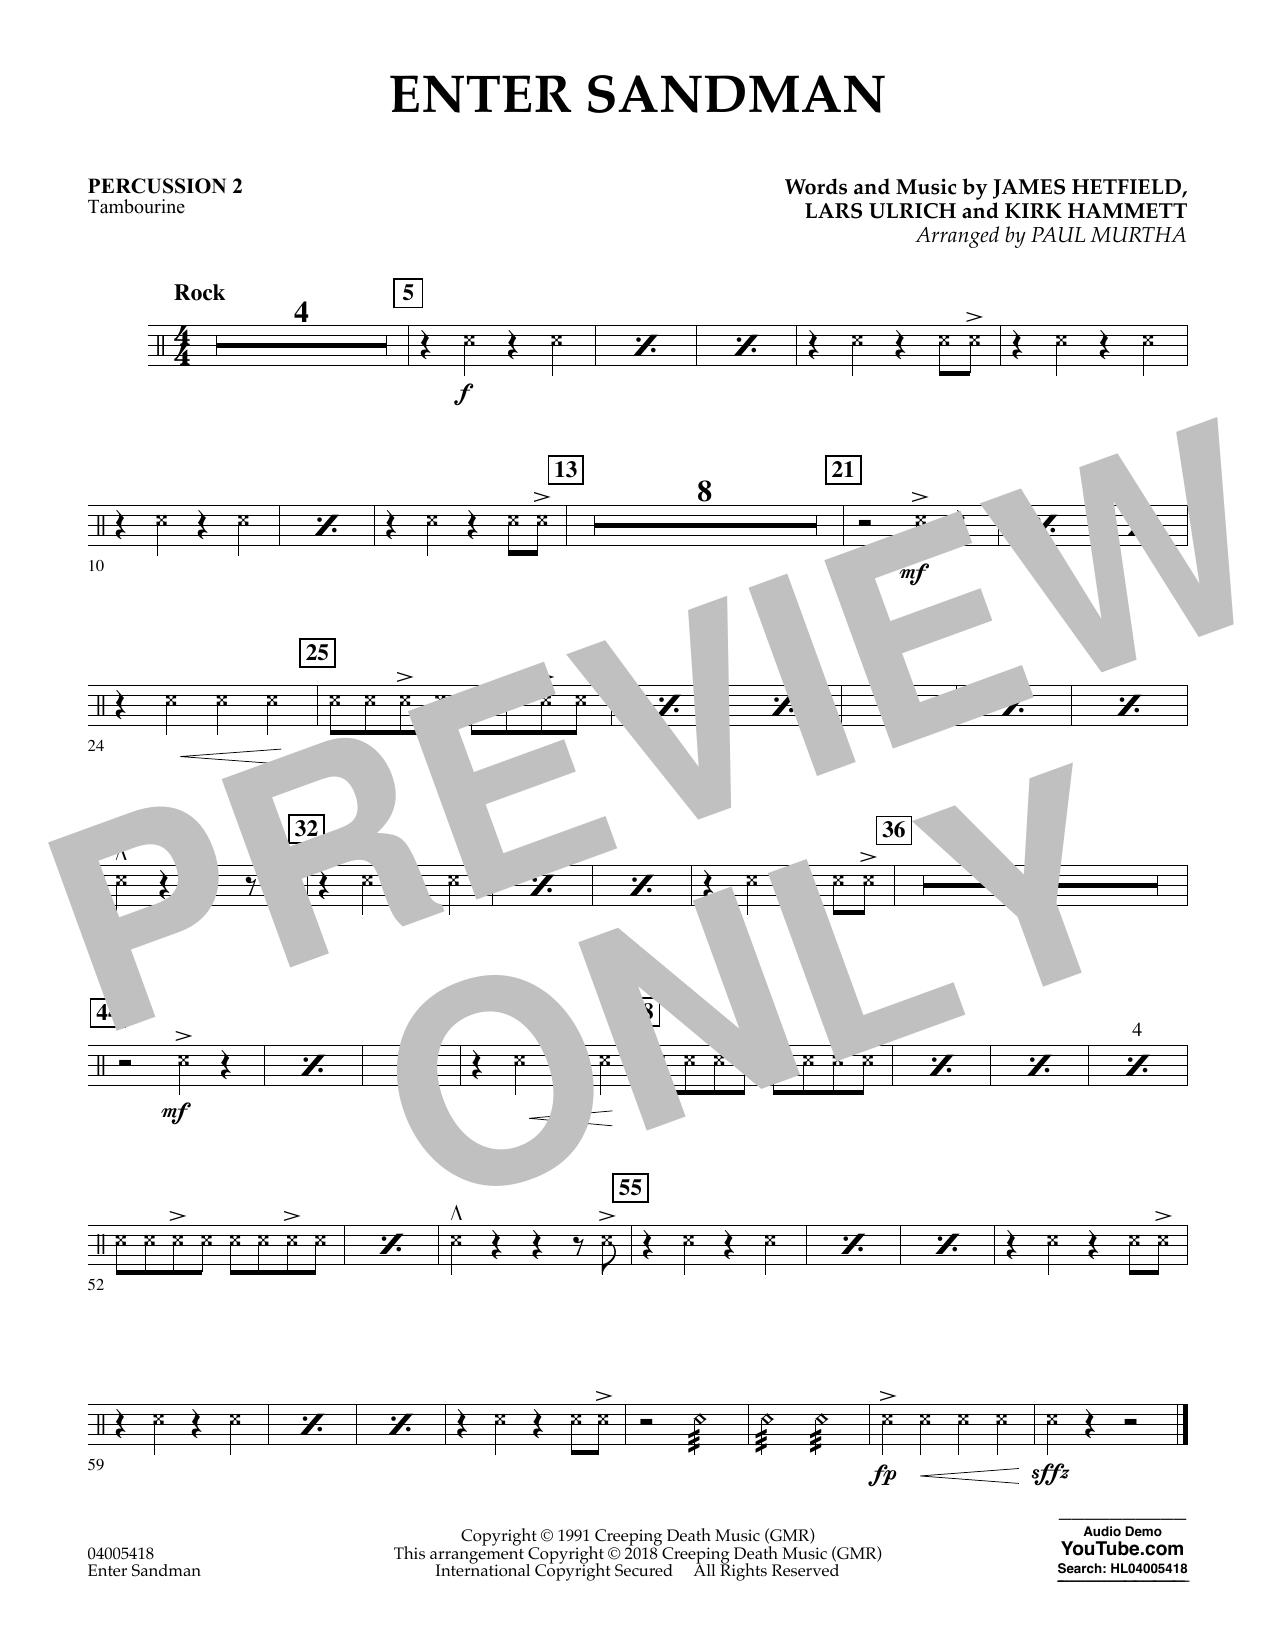 Enter Sandman - Percussion 2 (Concert Band)